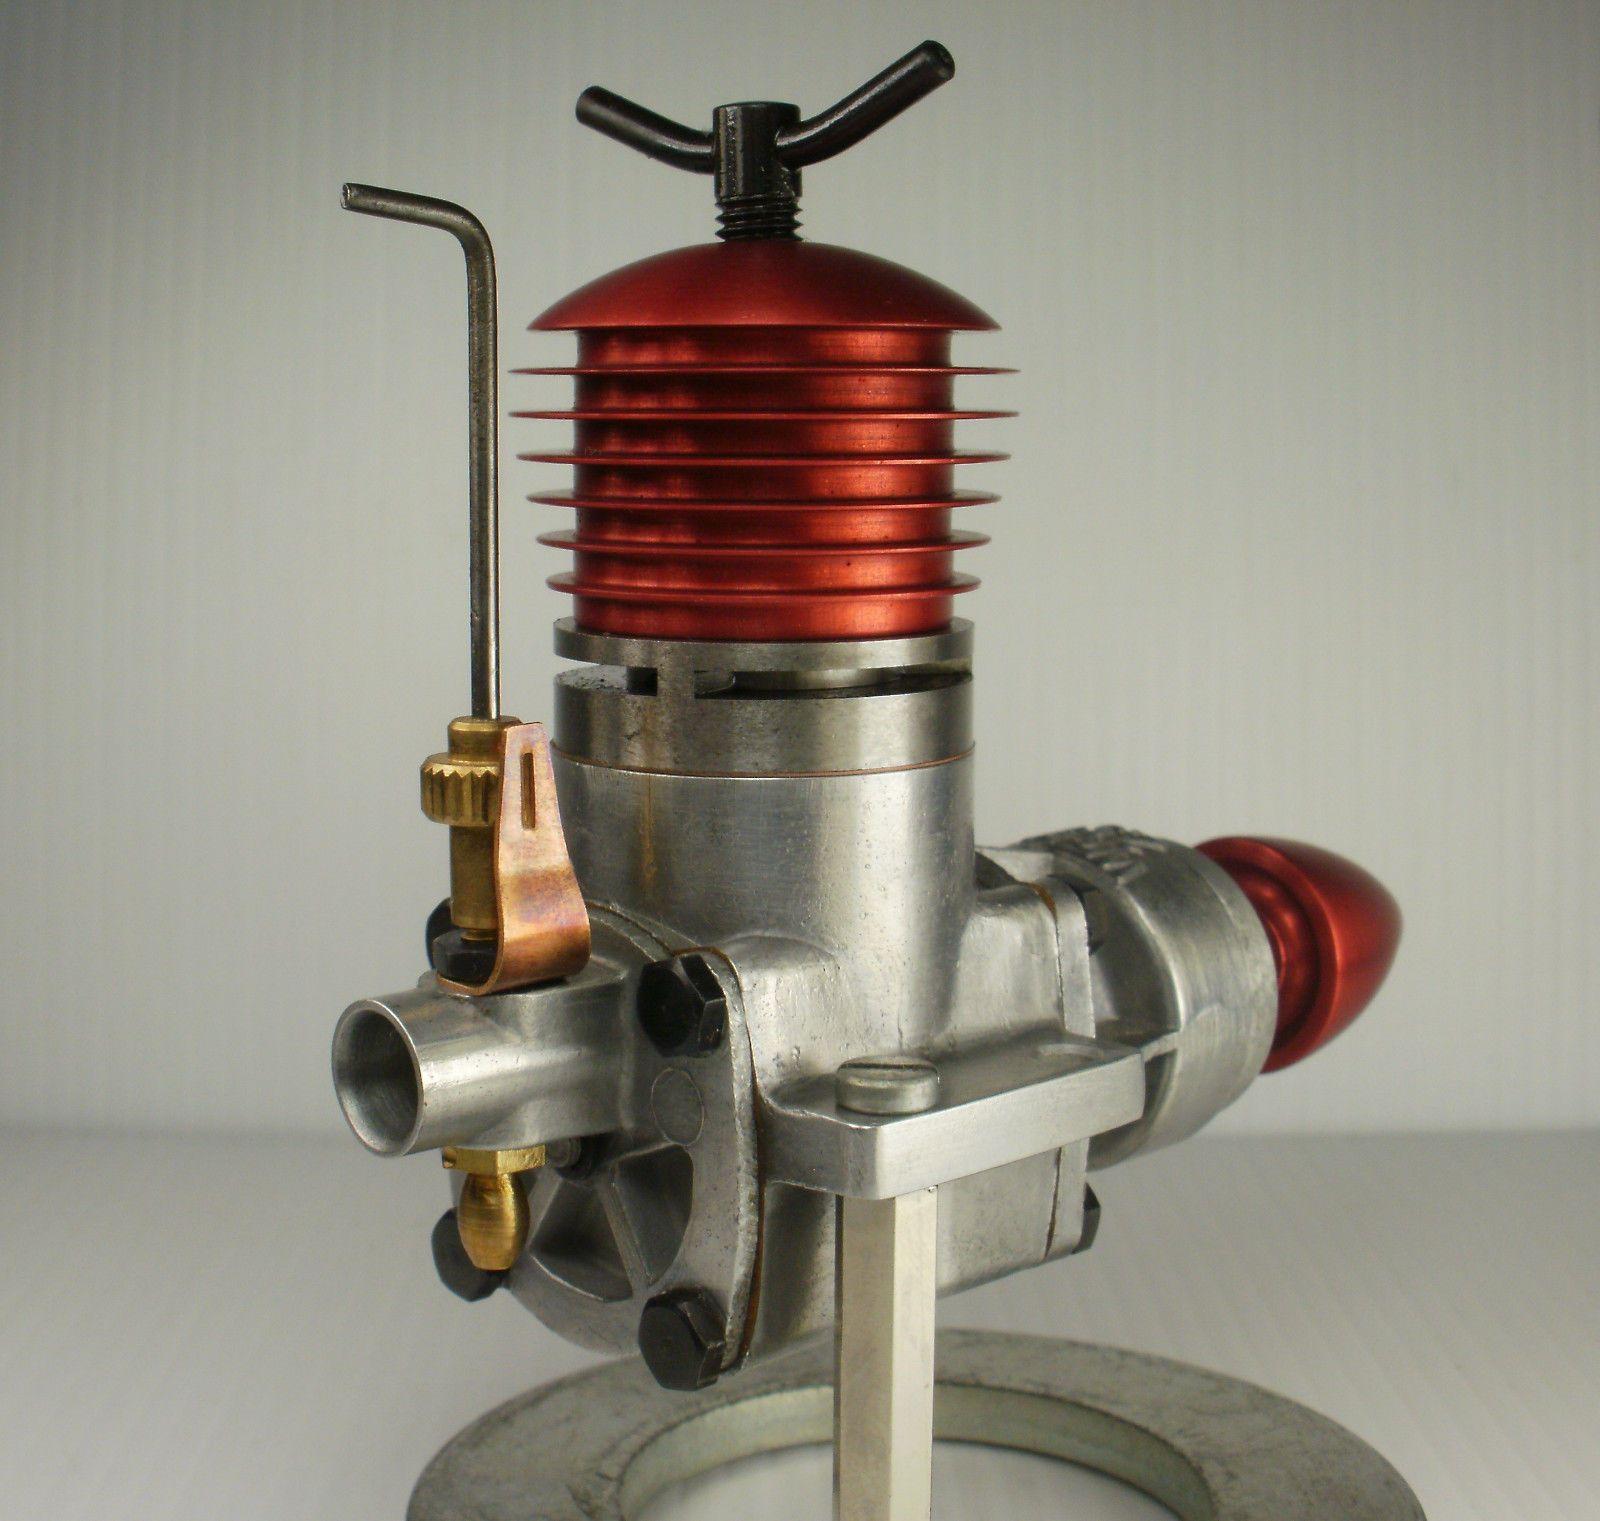 WEBRA MACH I Mk II 2.49 c.c. Diesel engine made in Germany